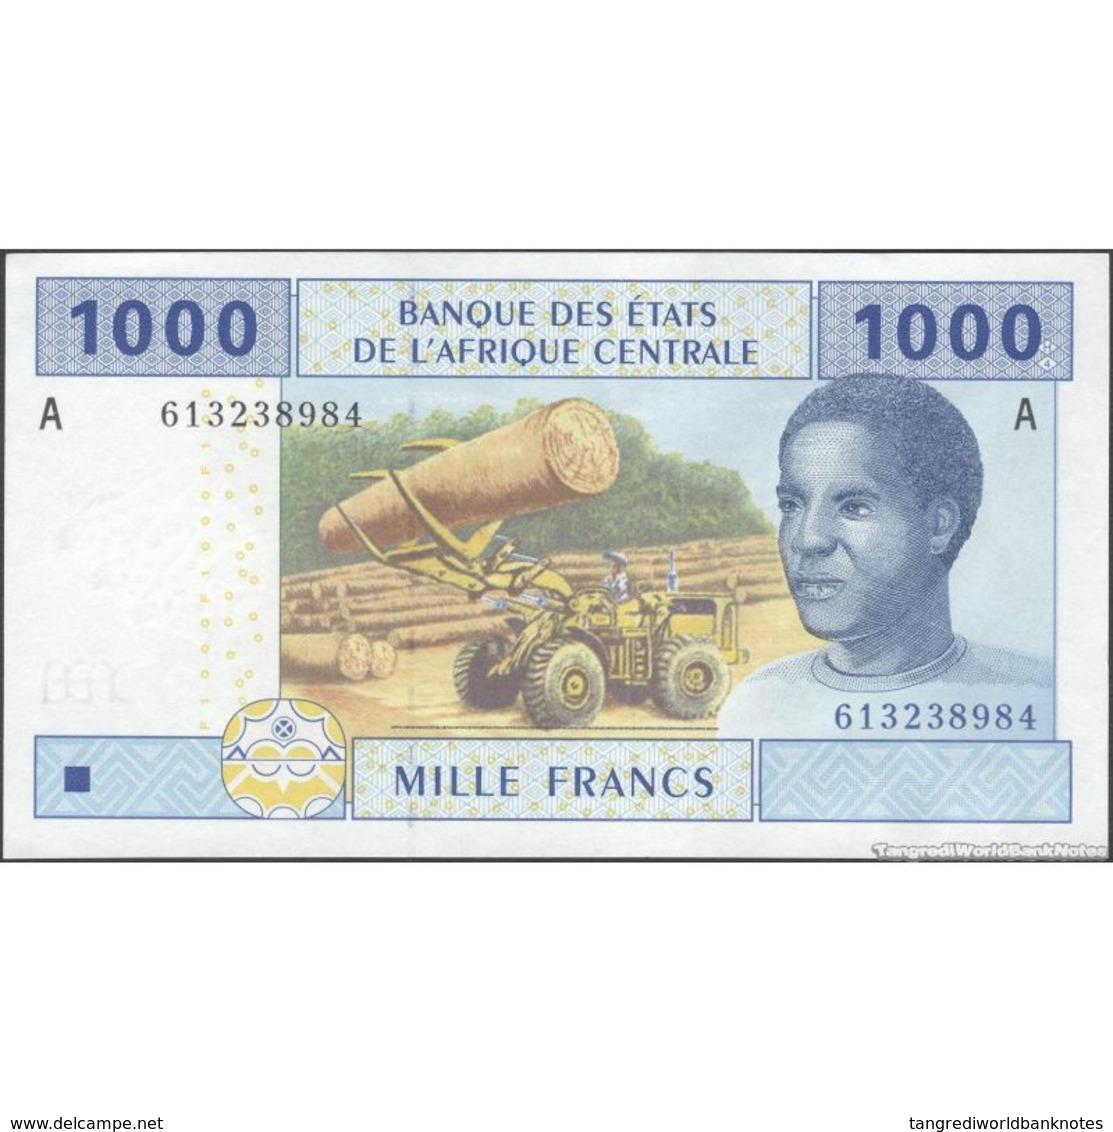 TWN - GABON (C.A.S.) 407Ac7 - 1000 1.000 Francs 2002 (2016) UNC - Gabon